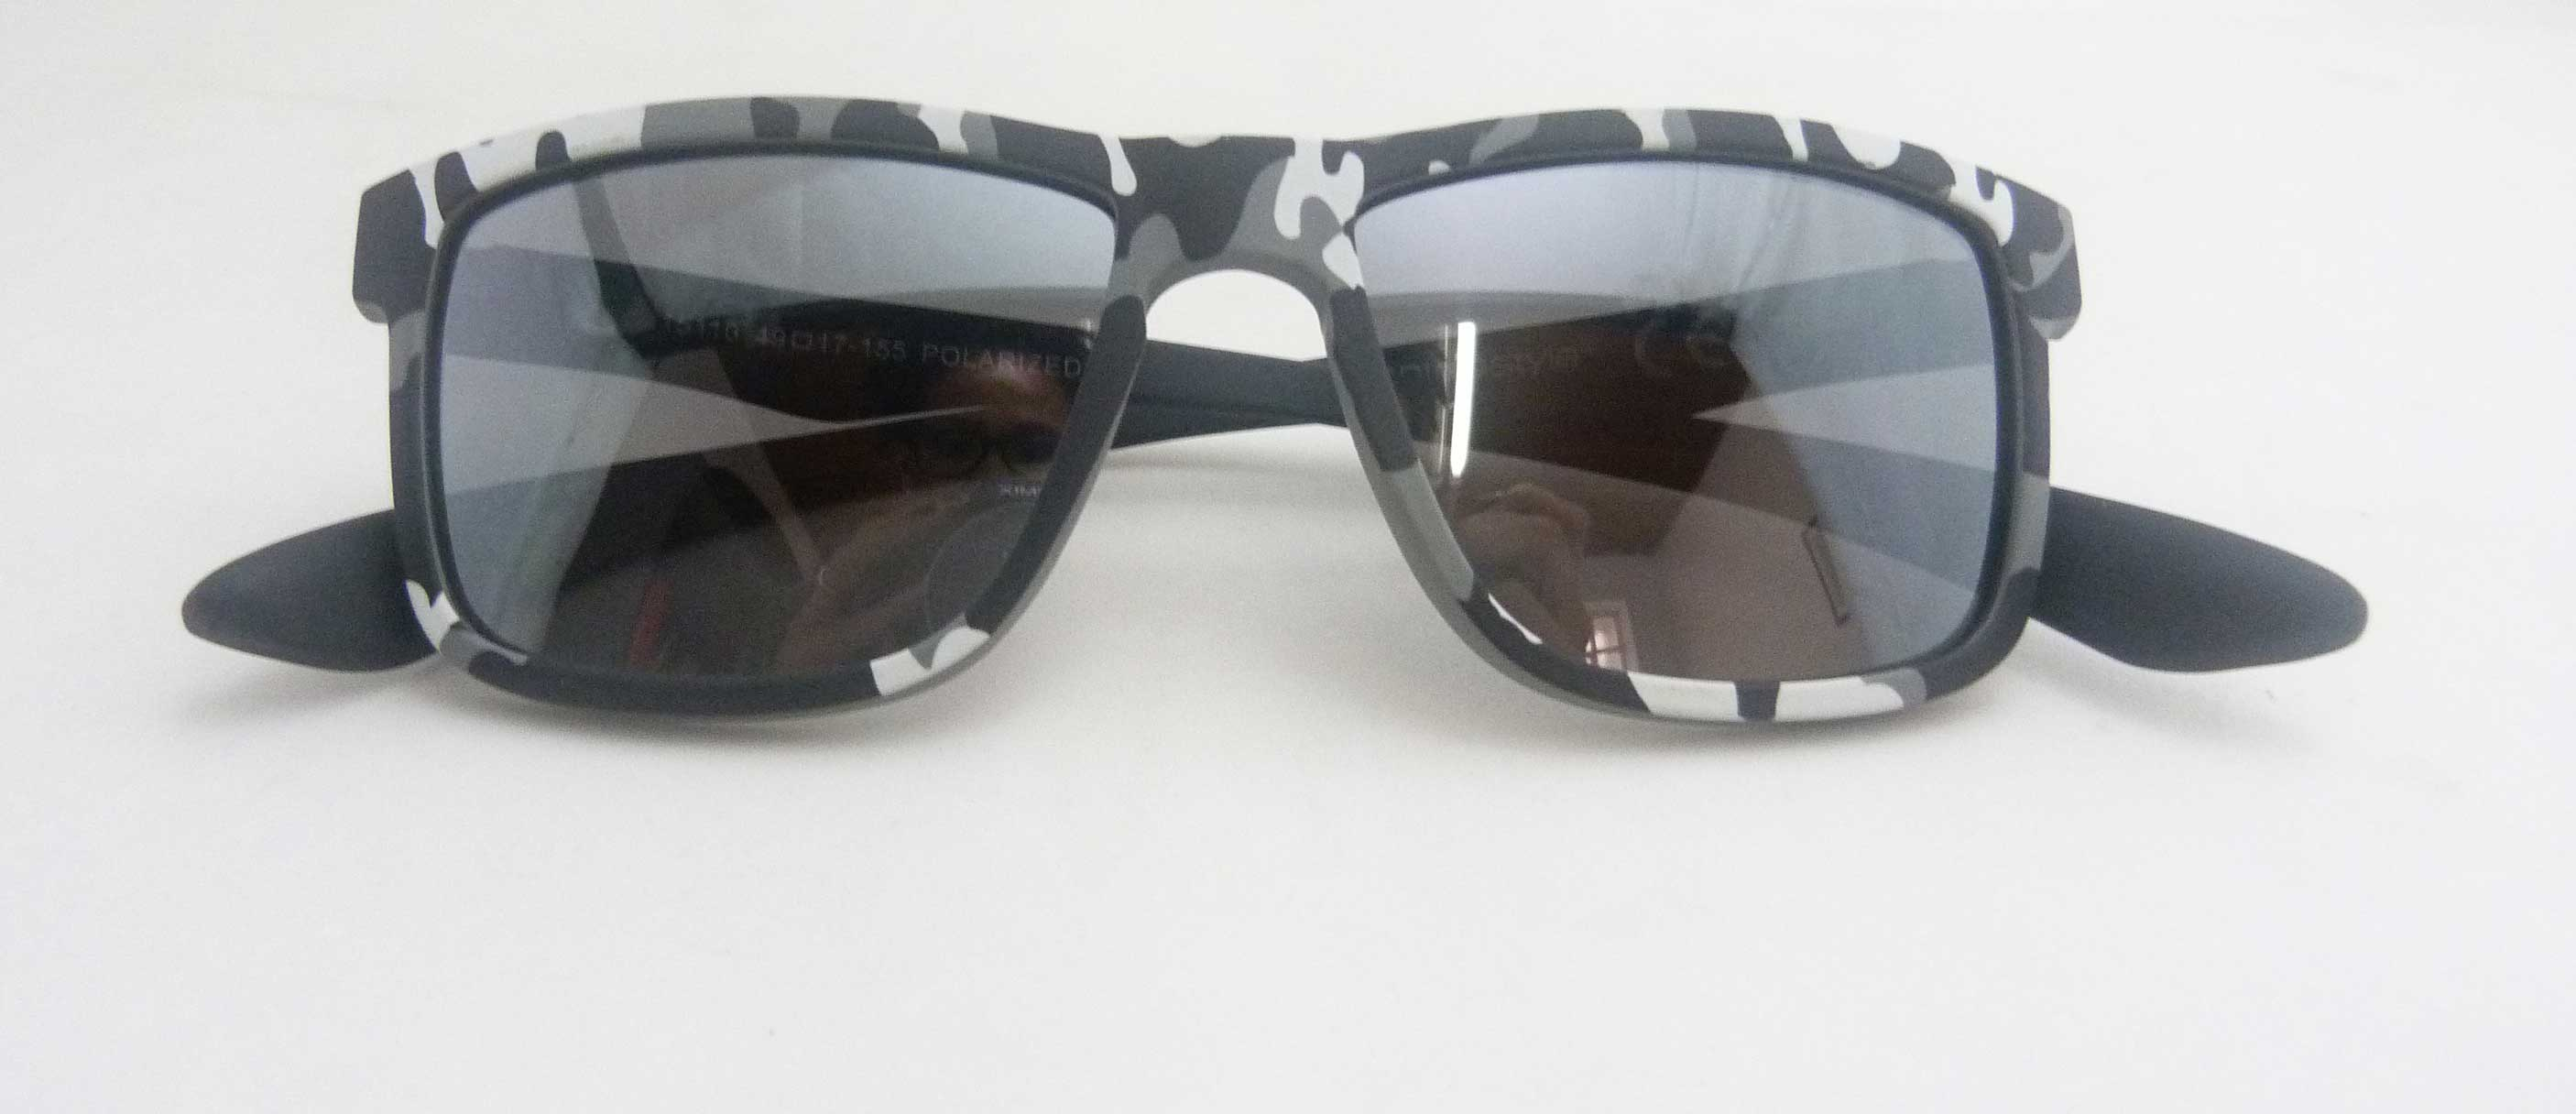 0215110 - Óculos-Solar CS Koala Camuflado 49x17 Cinza Mod 15110 FLAG 9  -Contém 1 Peça